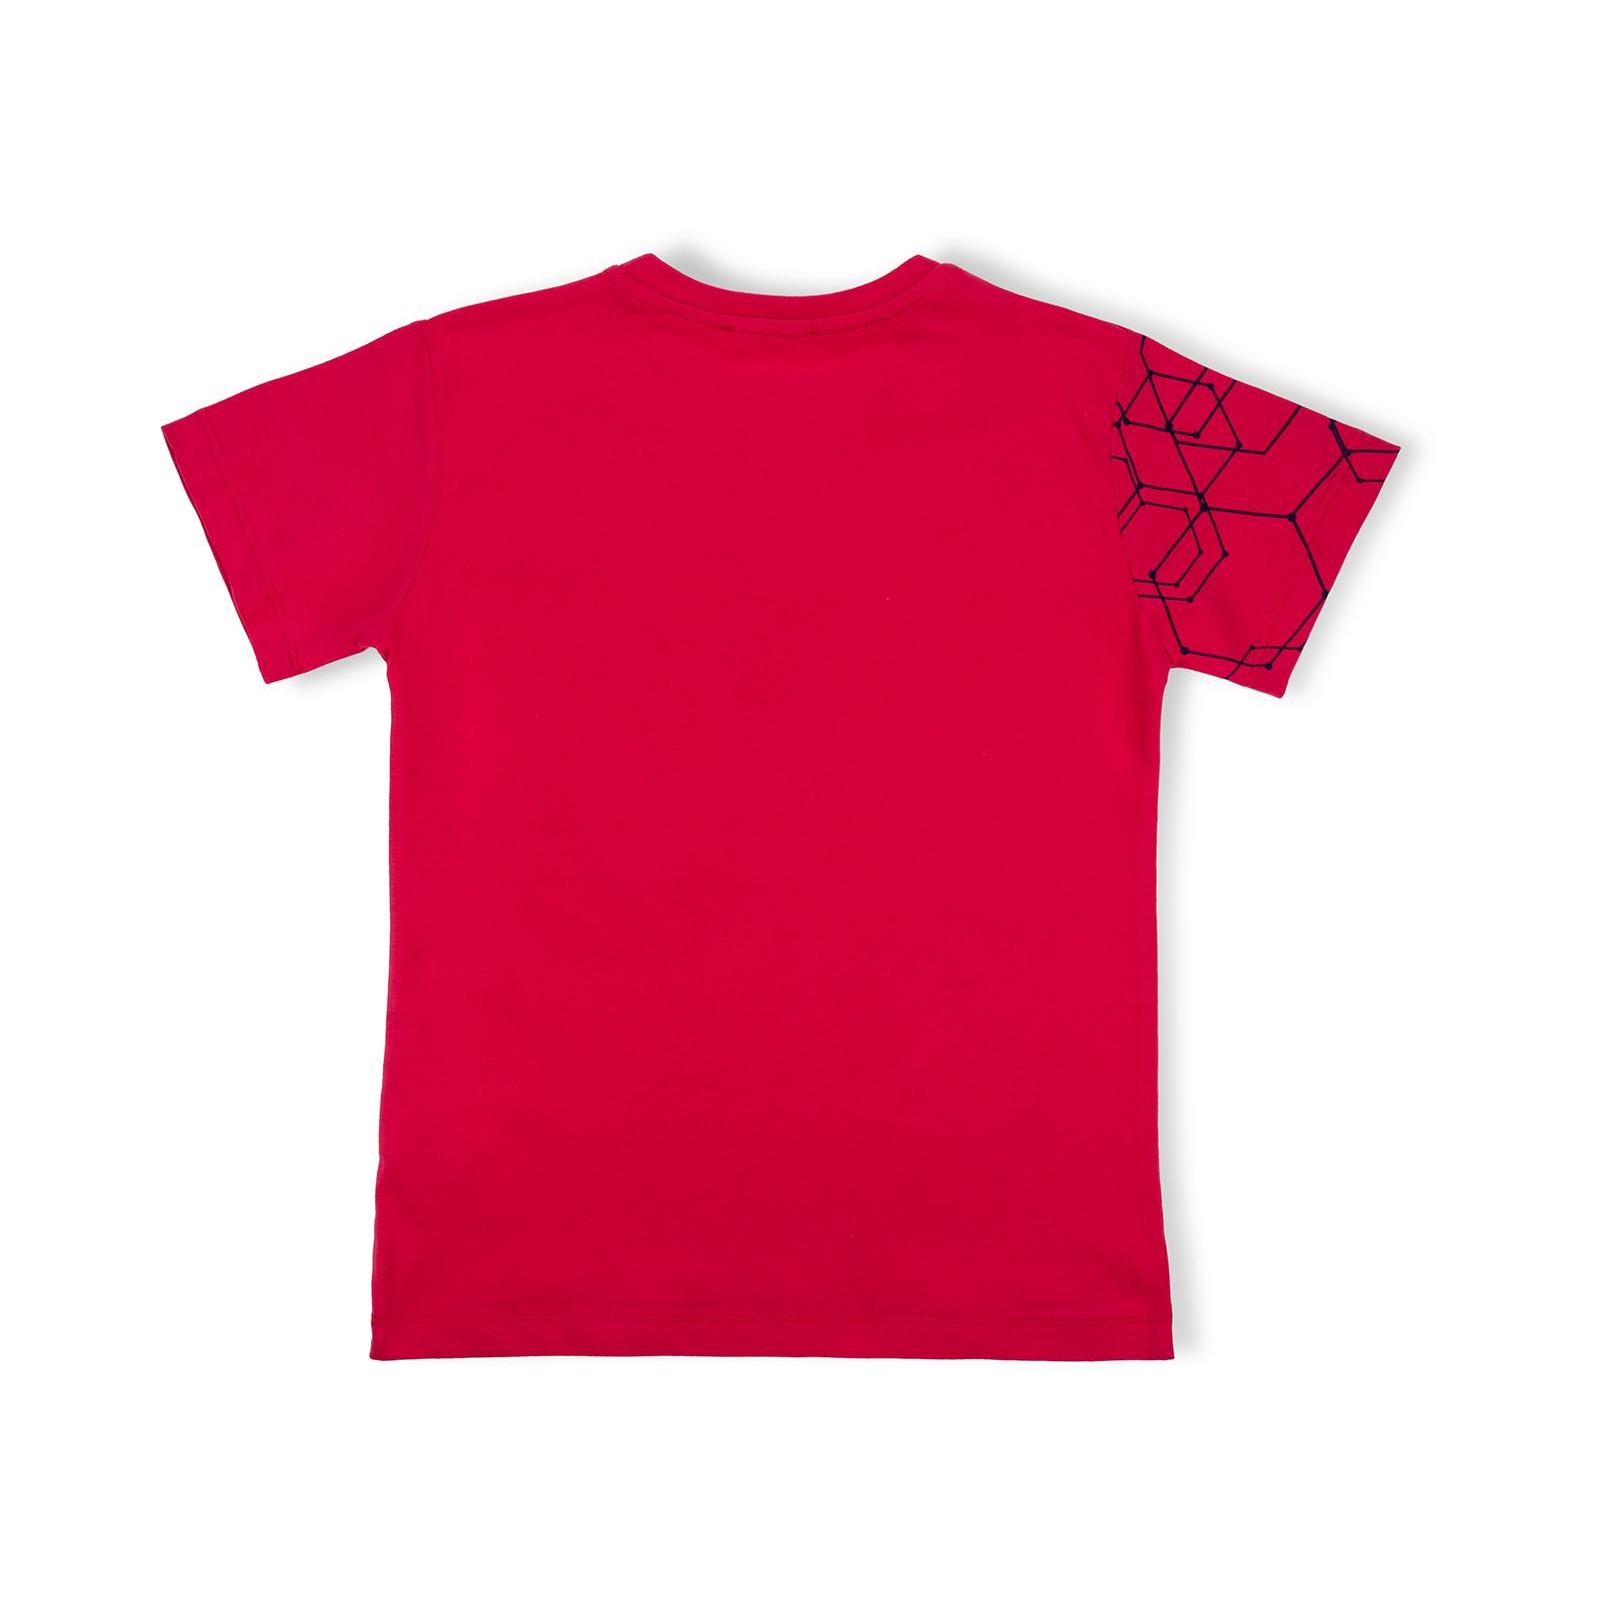 "Футболка детская Breeze ""STRATEGY"" (10152-1348B-red) изображение 2"